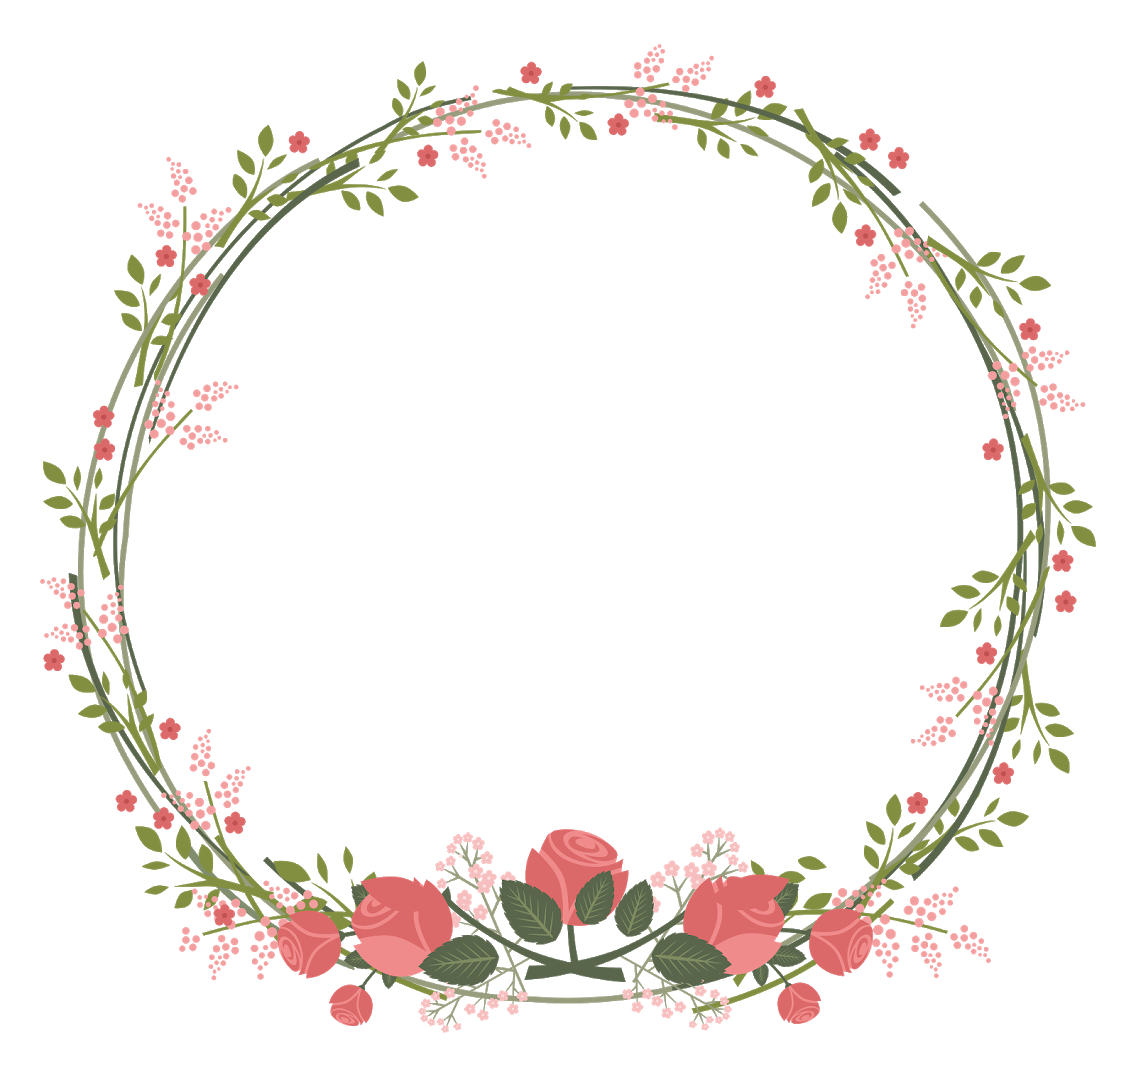 border frame wreath circle round leaves vines vinesan...